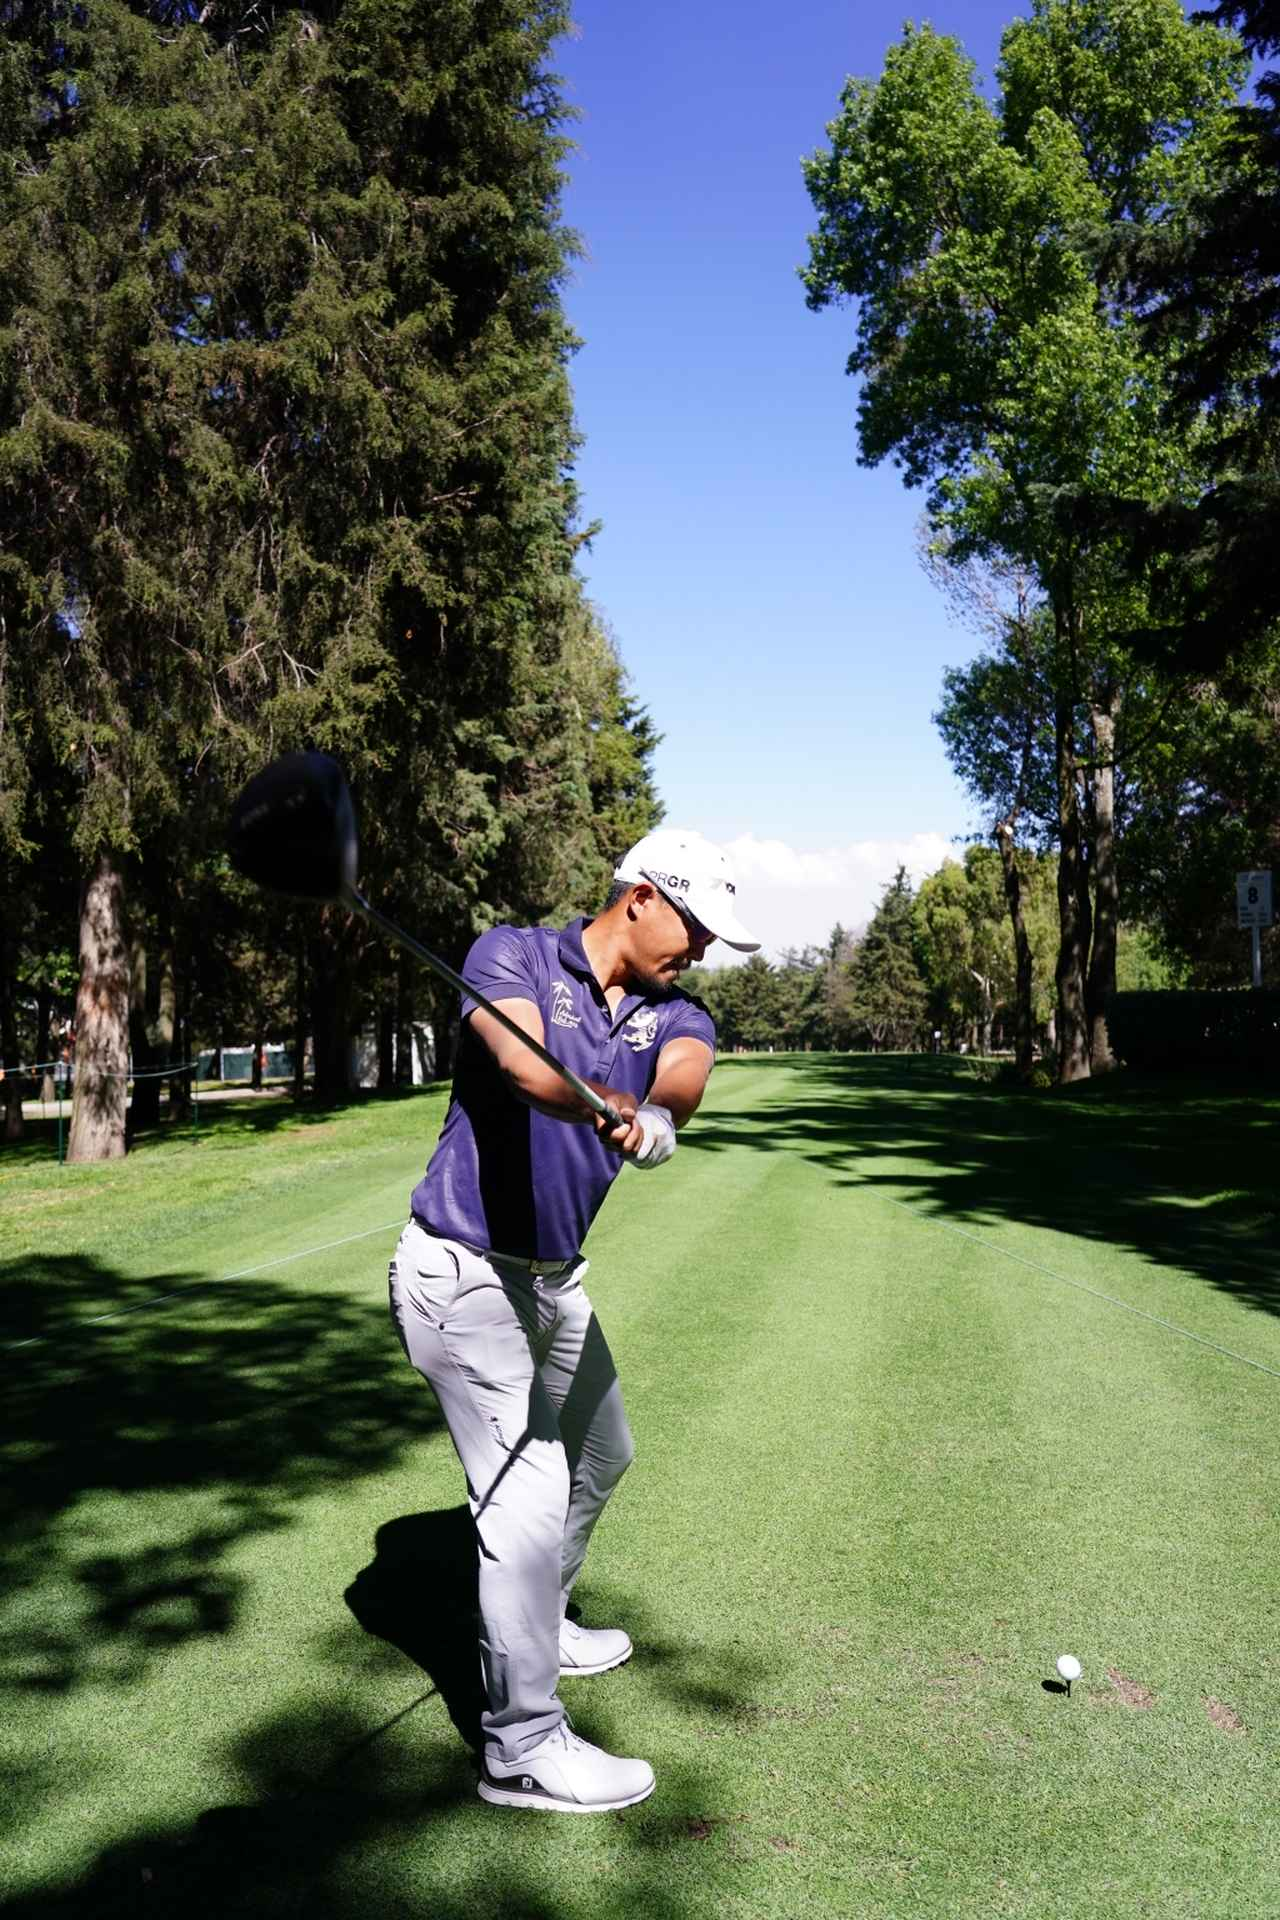 Images : 3番目の画像 - 小平智のドライバー連続写真 - みんなのゴルフダイジェスト